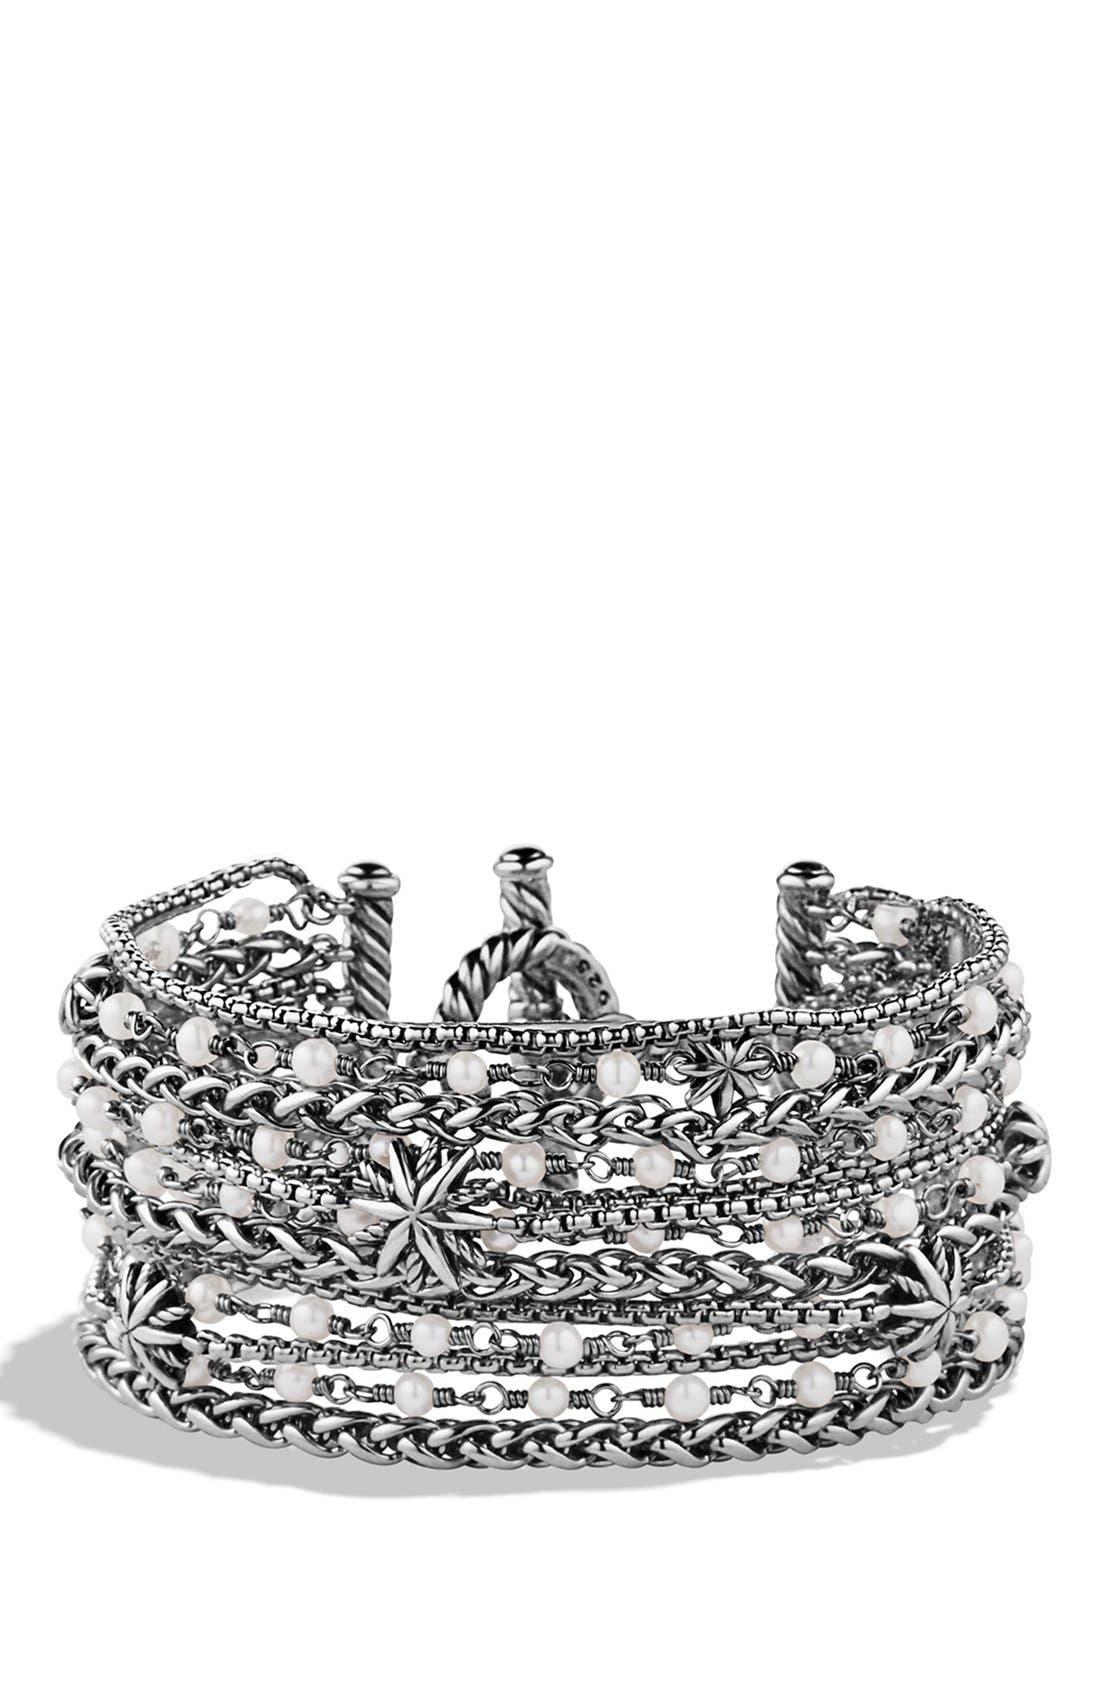 David Yurman 'Starburst' Chain Bracelet with Pearls